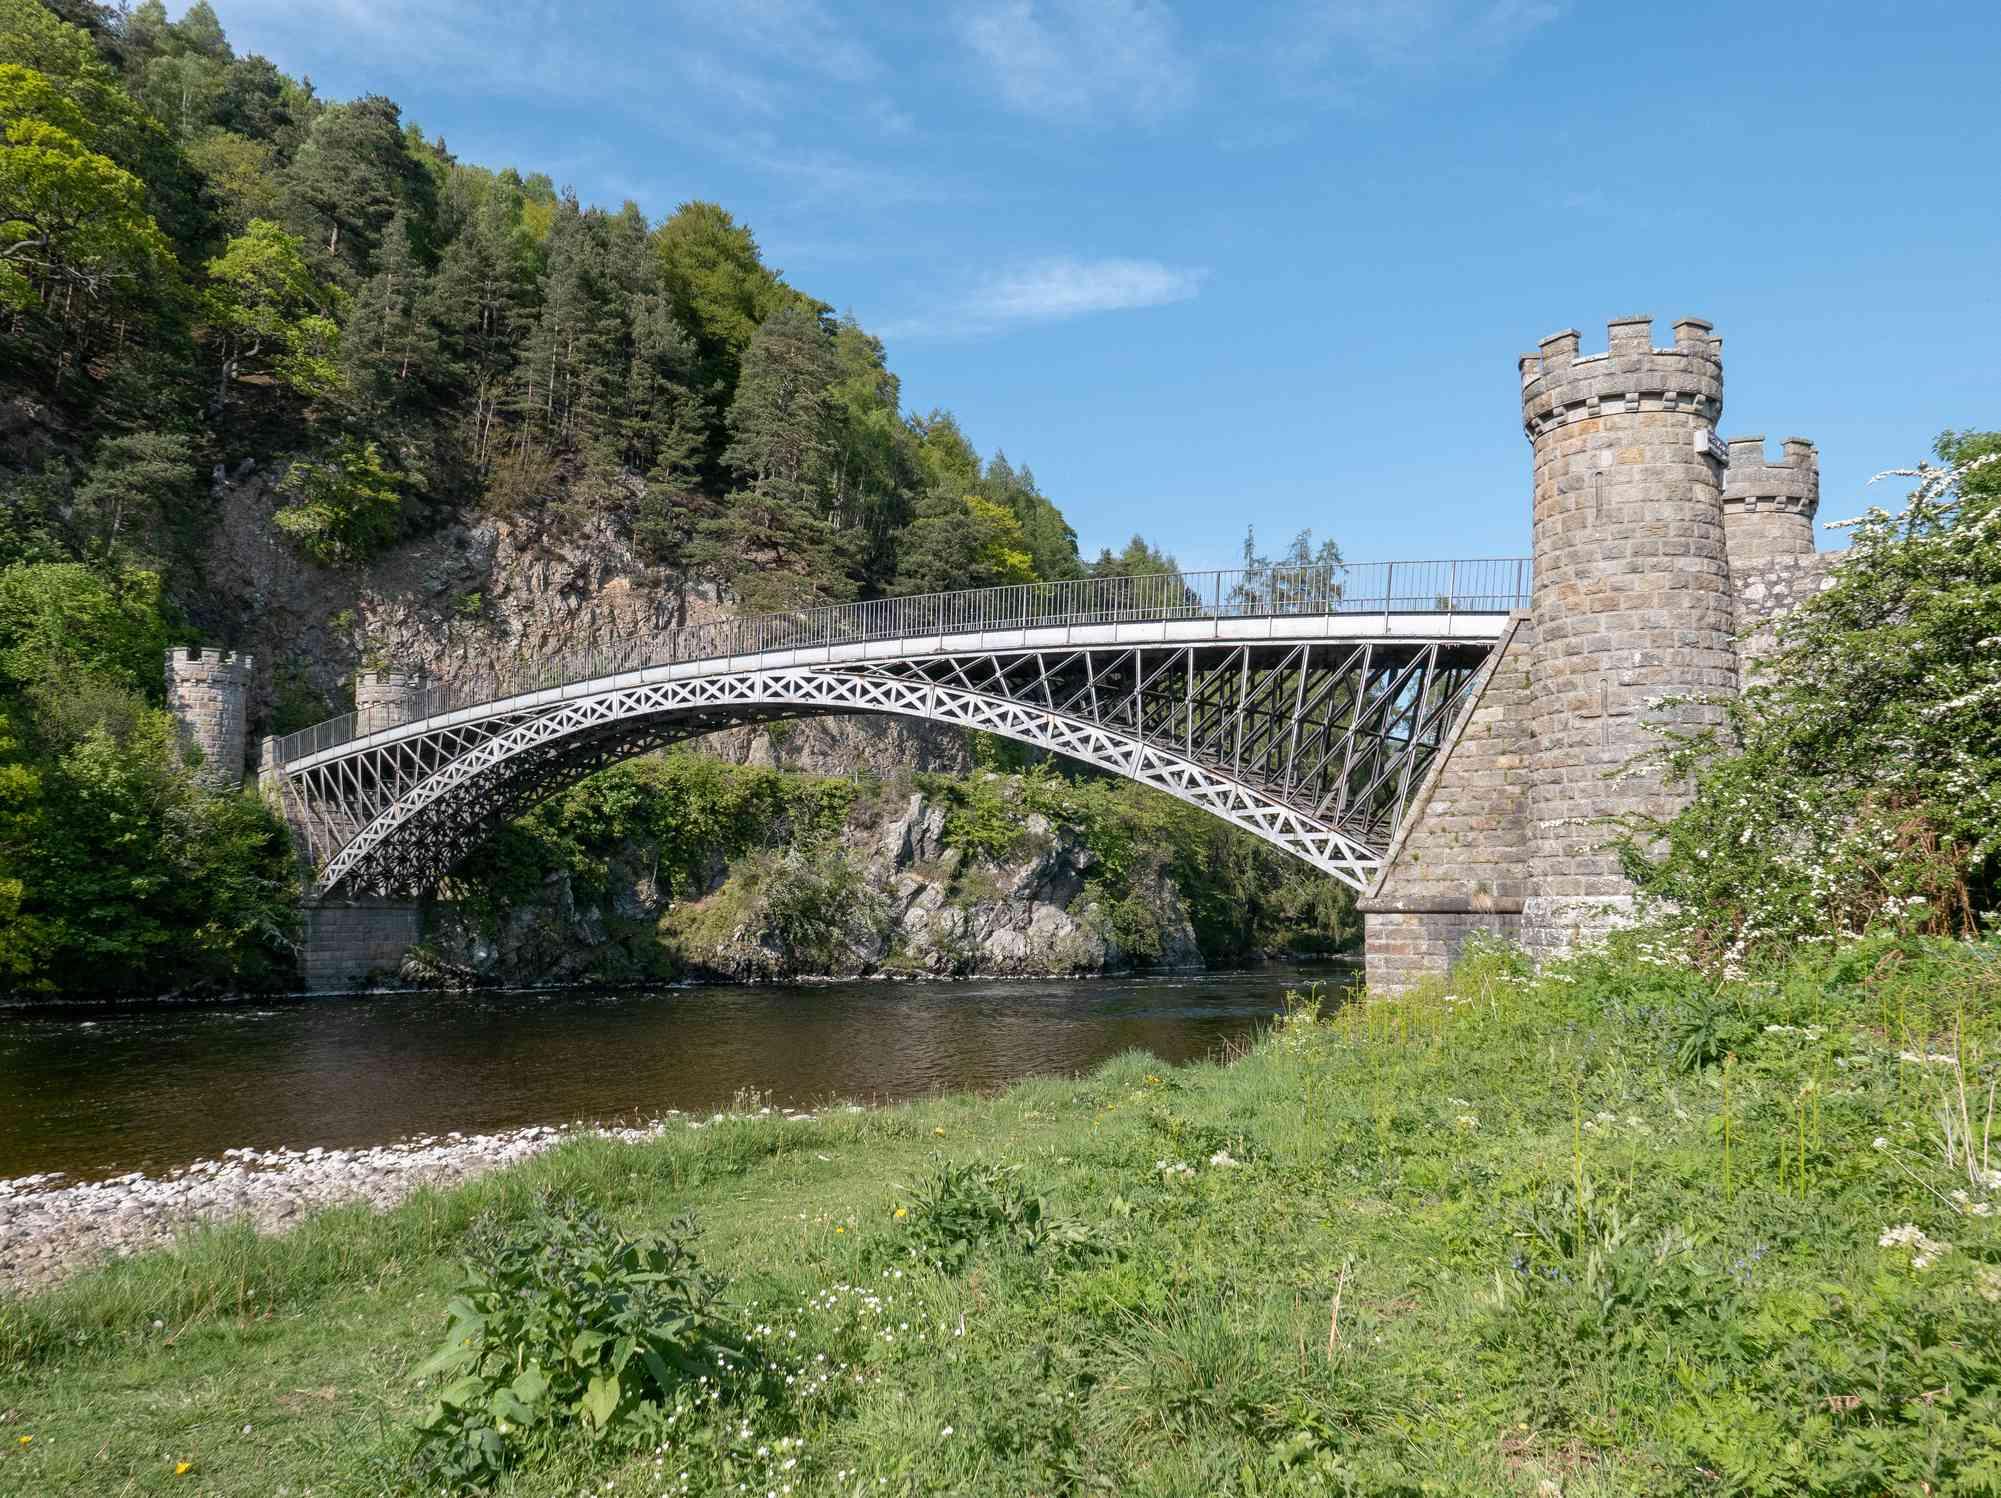 Craigellachie Bridge spanning the River Spey